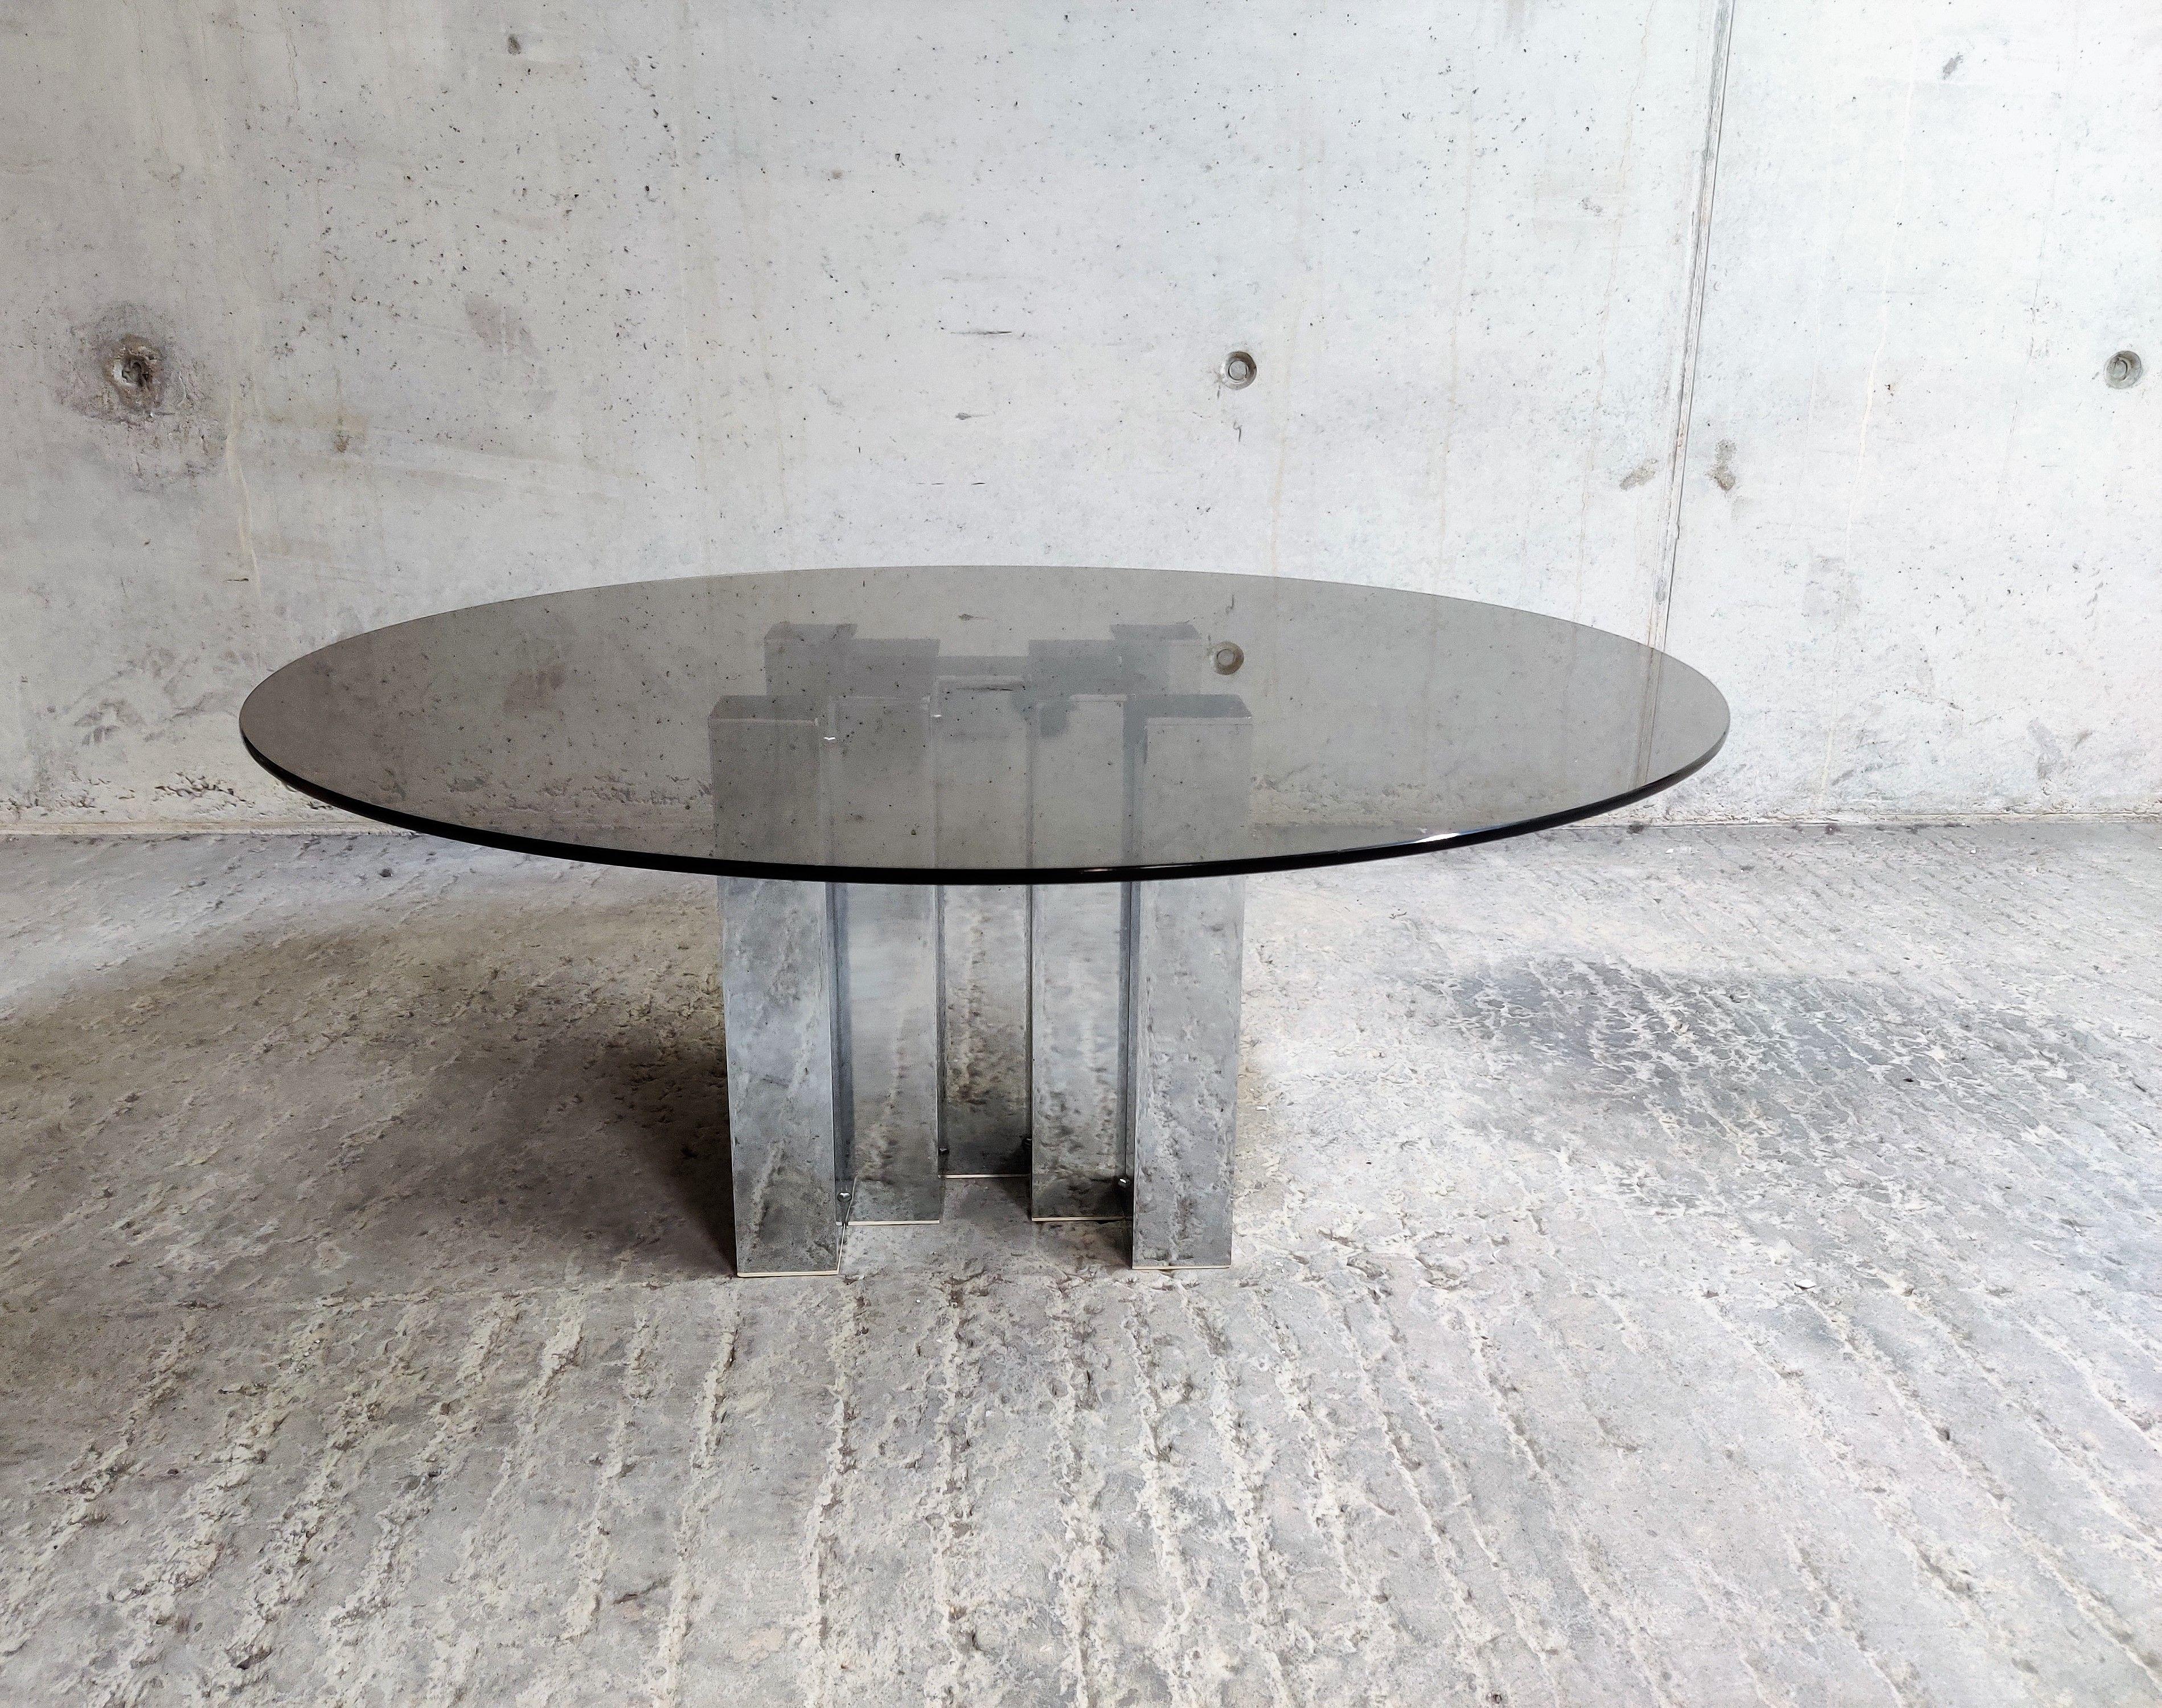 Pin By Tshego Tshombe On Waterkloof P2 Round Glass Coffee Table Coffee Table Round Coffee Table [ 3000 x 3797 Pixel ]